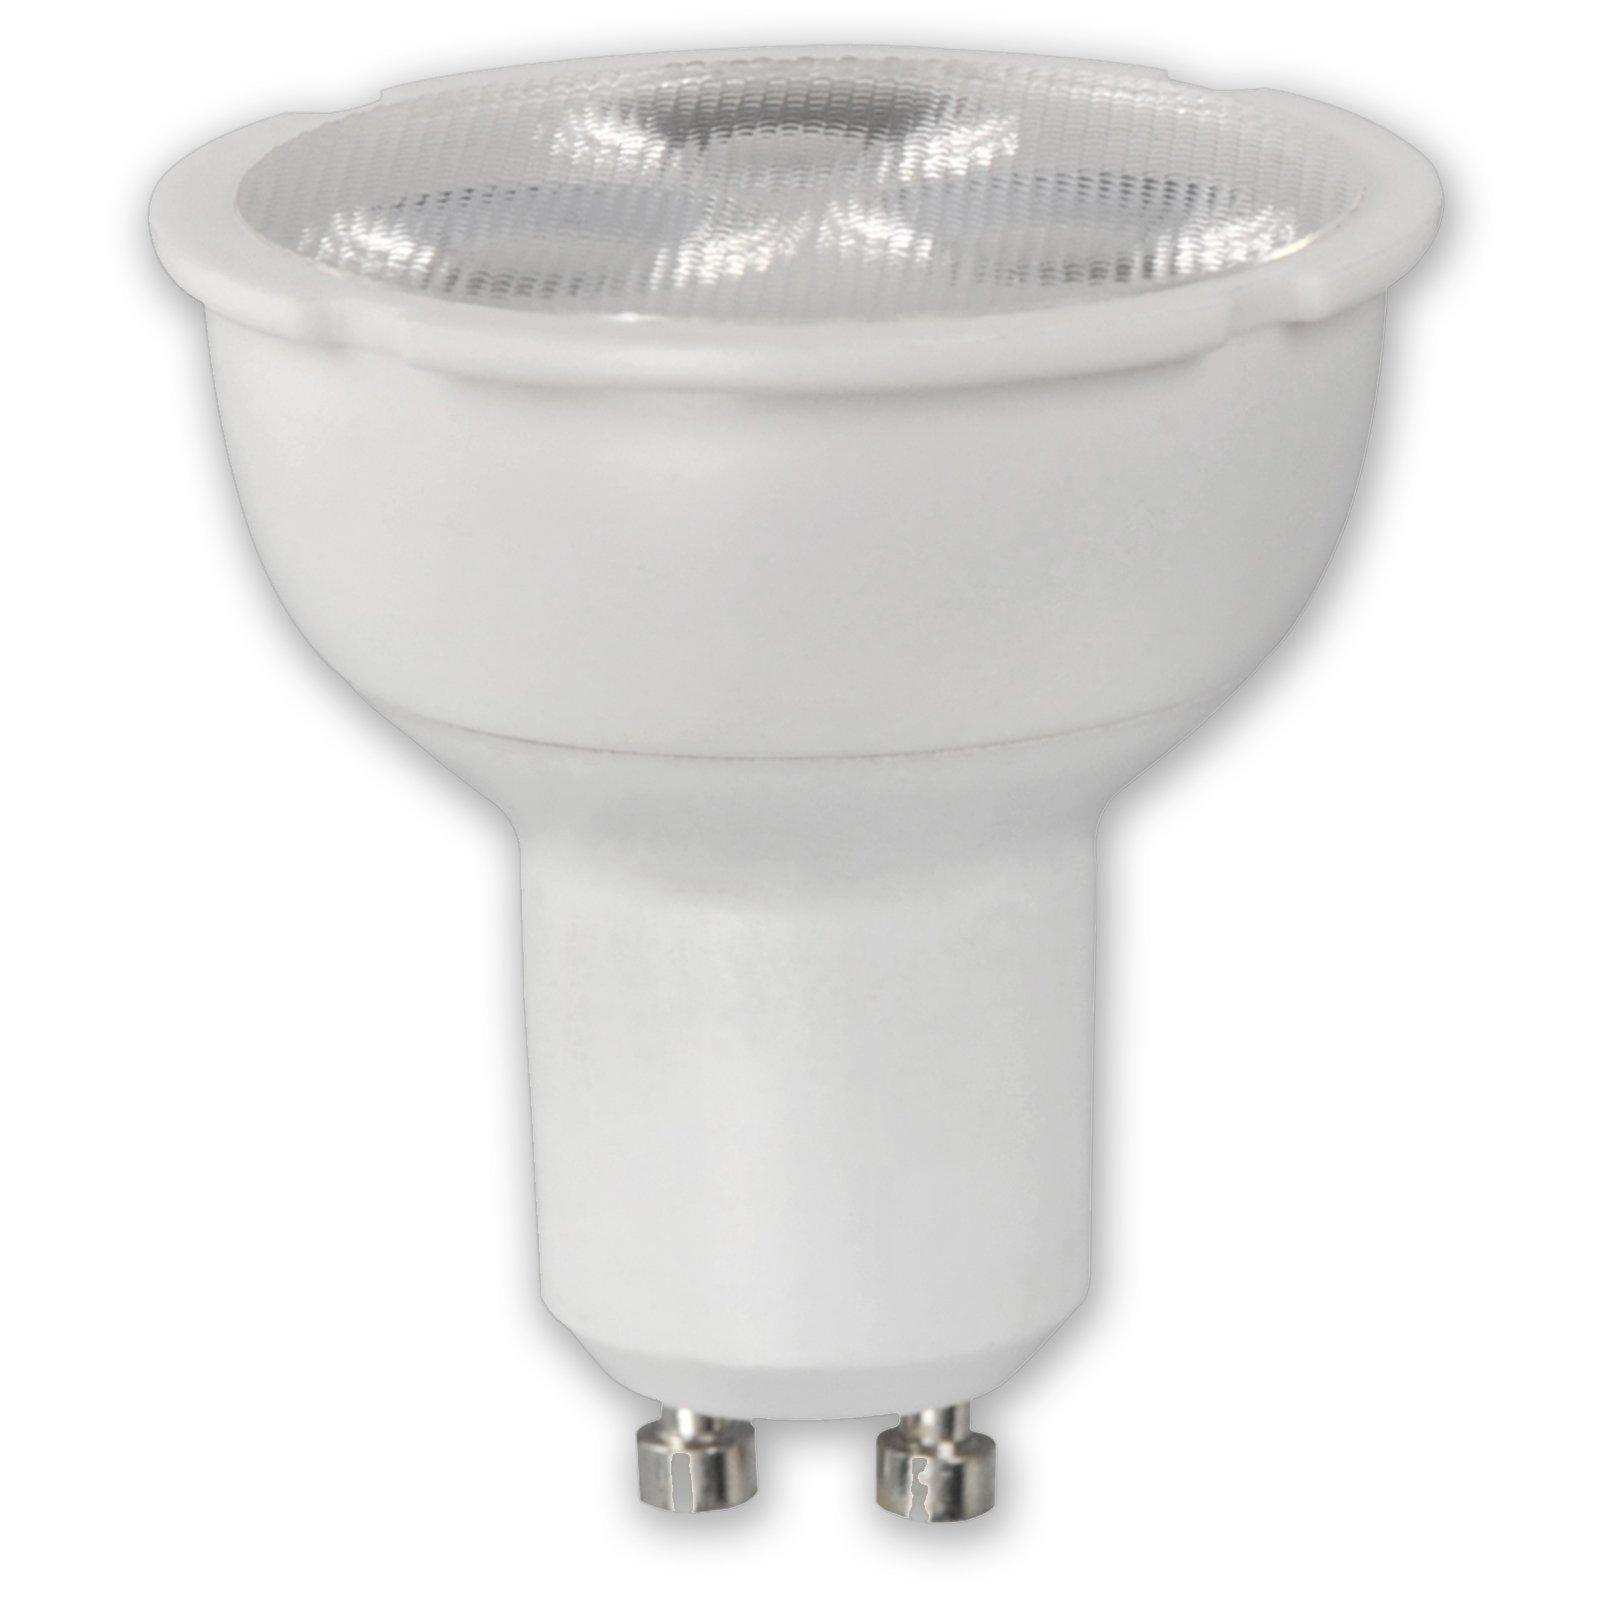 led reflektor leuchtmittel gu10 5 7 watt led leuchtmittel leuchtmittel gl hbirnen. Black Bedroom Furniture Sets. Home Design Ideas